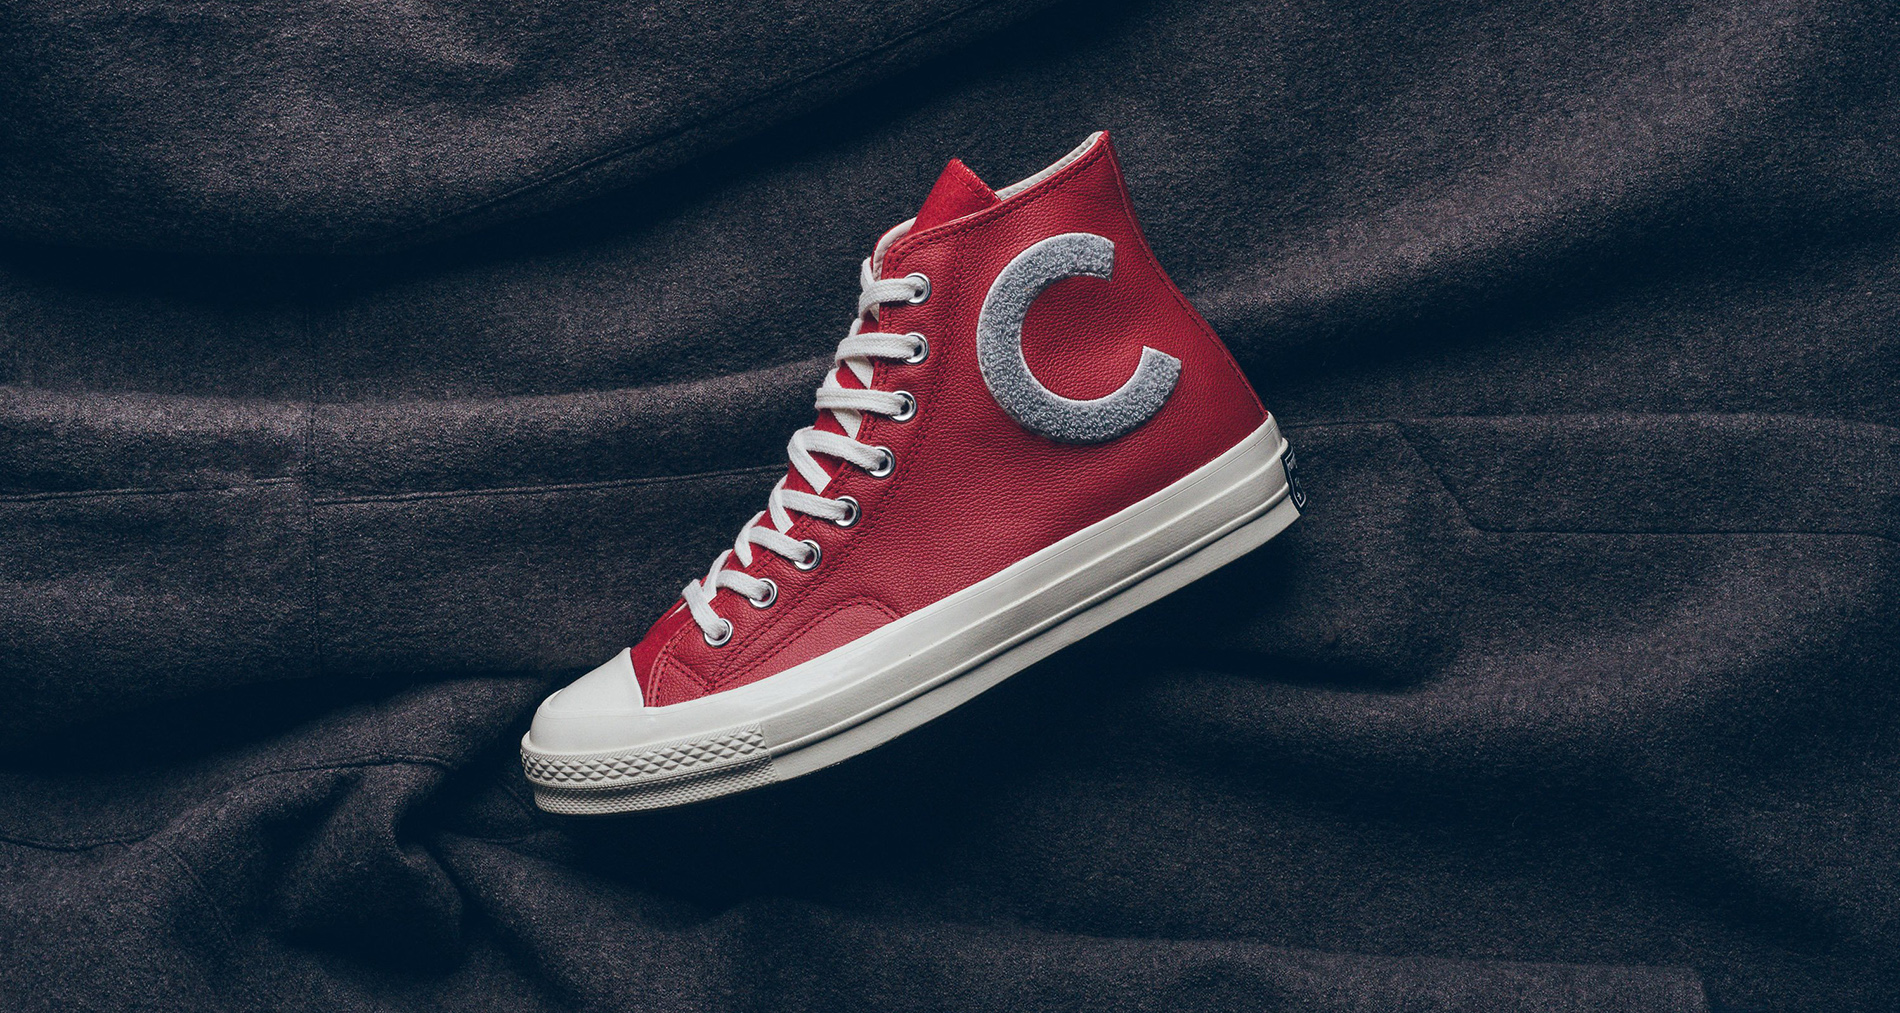 Converse CTAS '70 High Enamel Red/Wolf